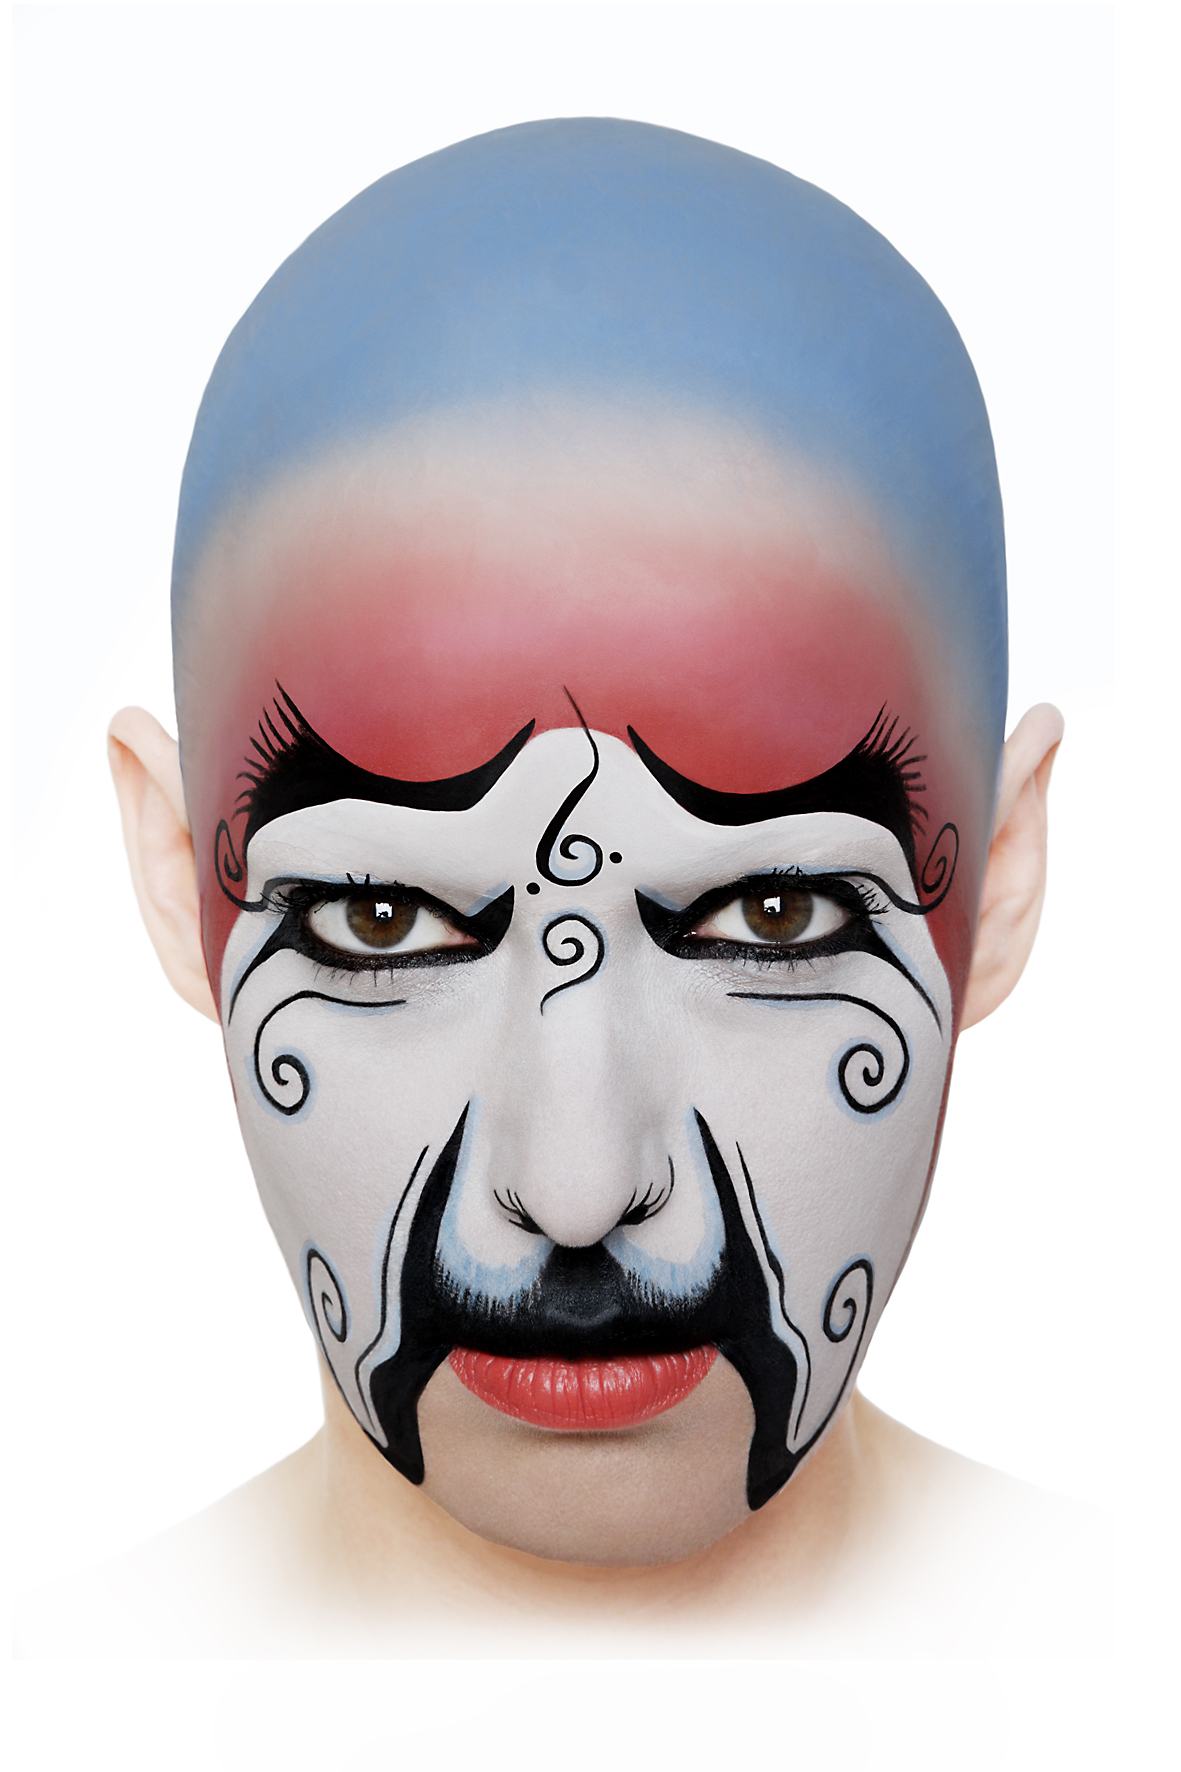 Geiles Globales Gesicht # 09  , 2008, self-portrait, lambda print, 80 cm x 120 cm.